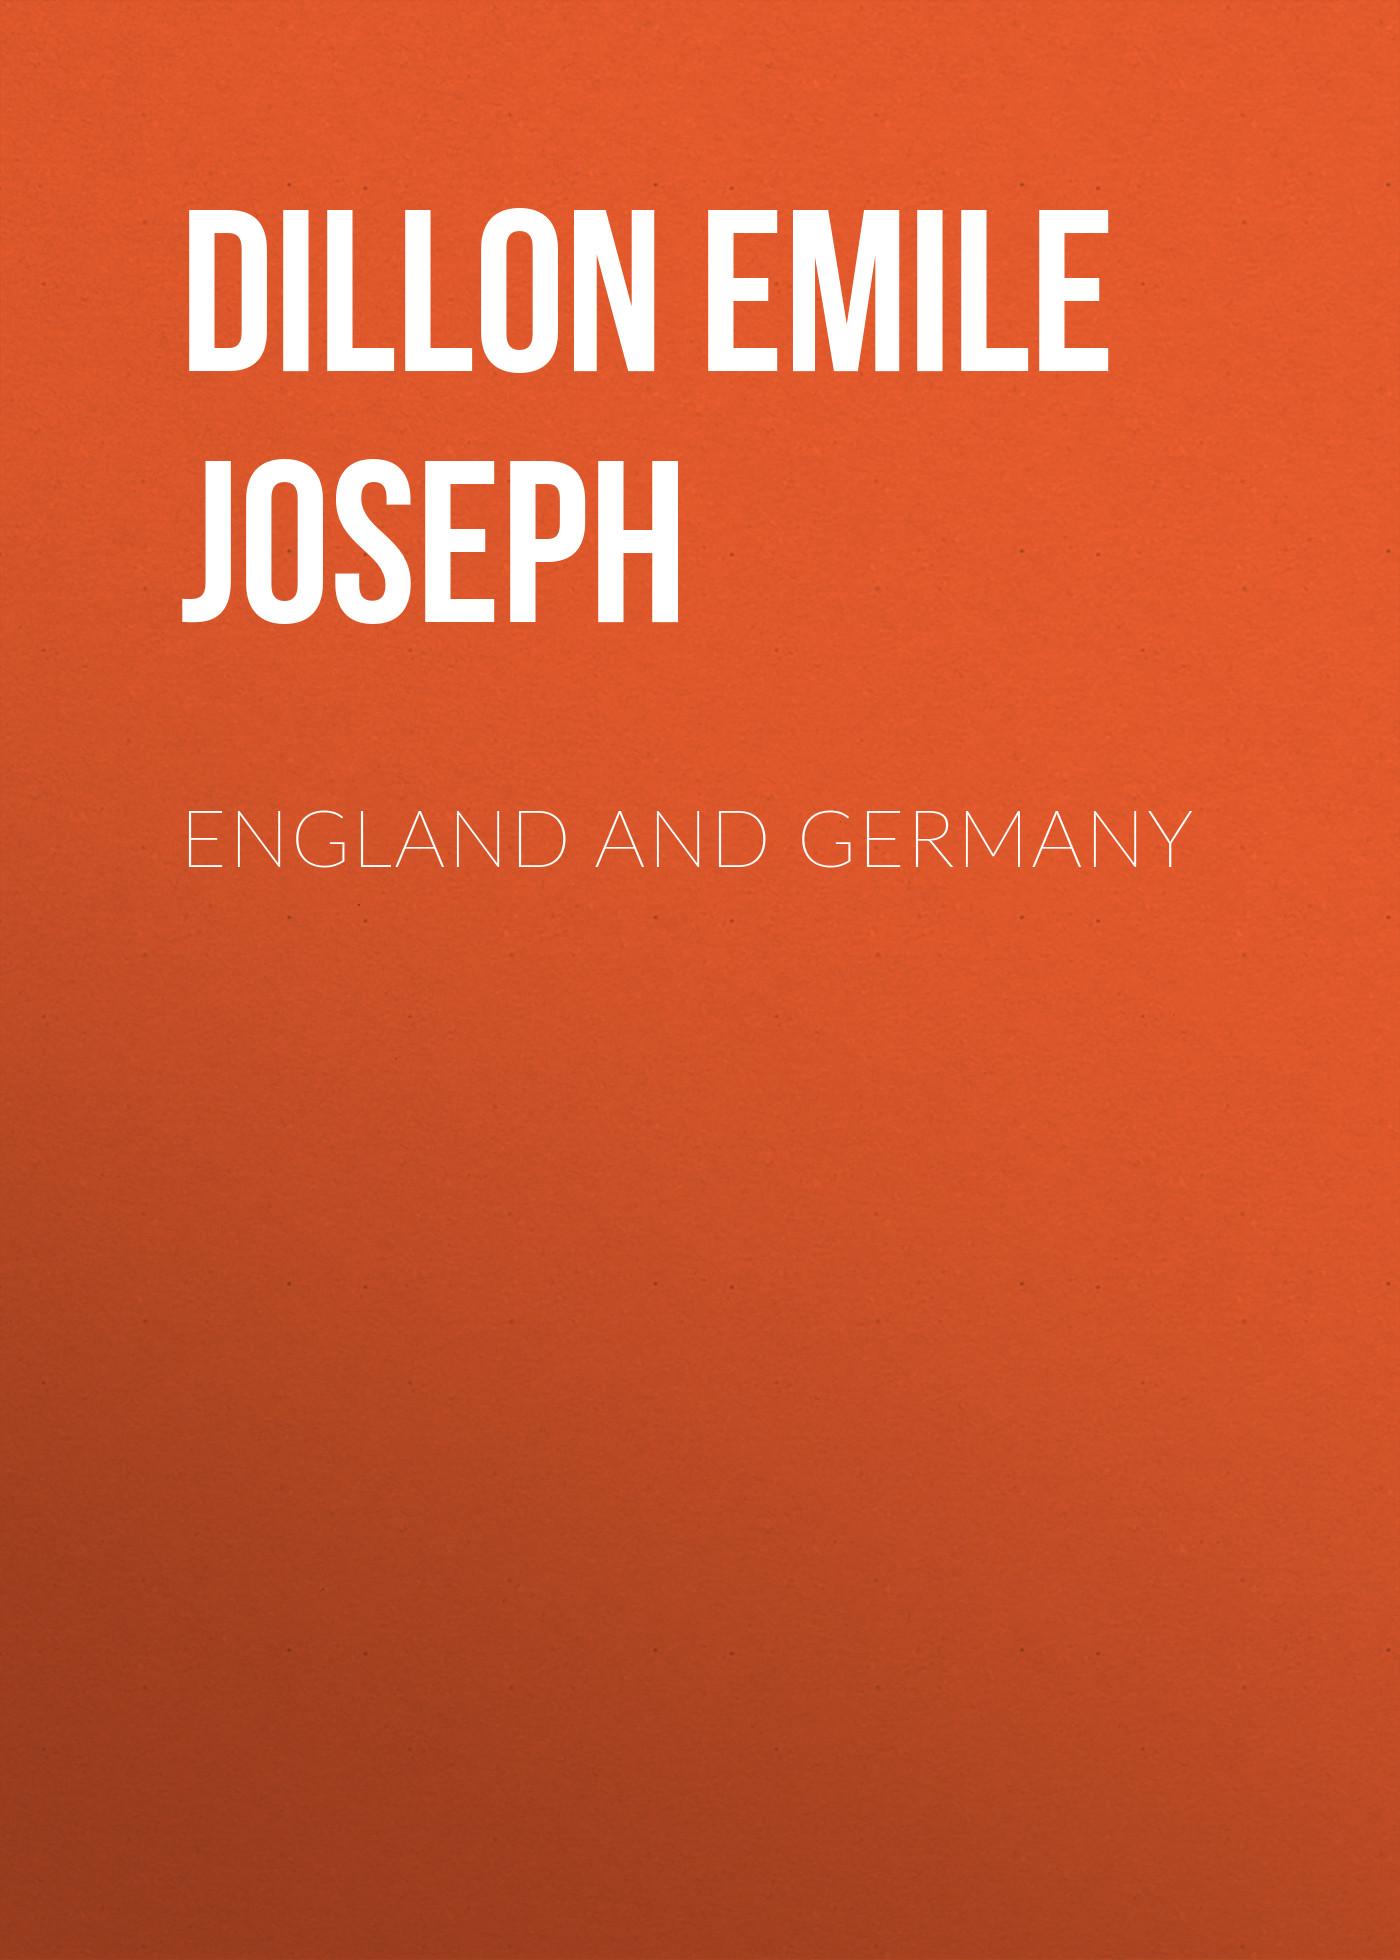 Dillon Emile Joseph England and Germany dillon emile joseph england and germany